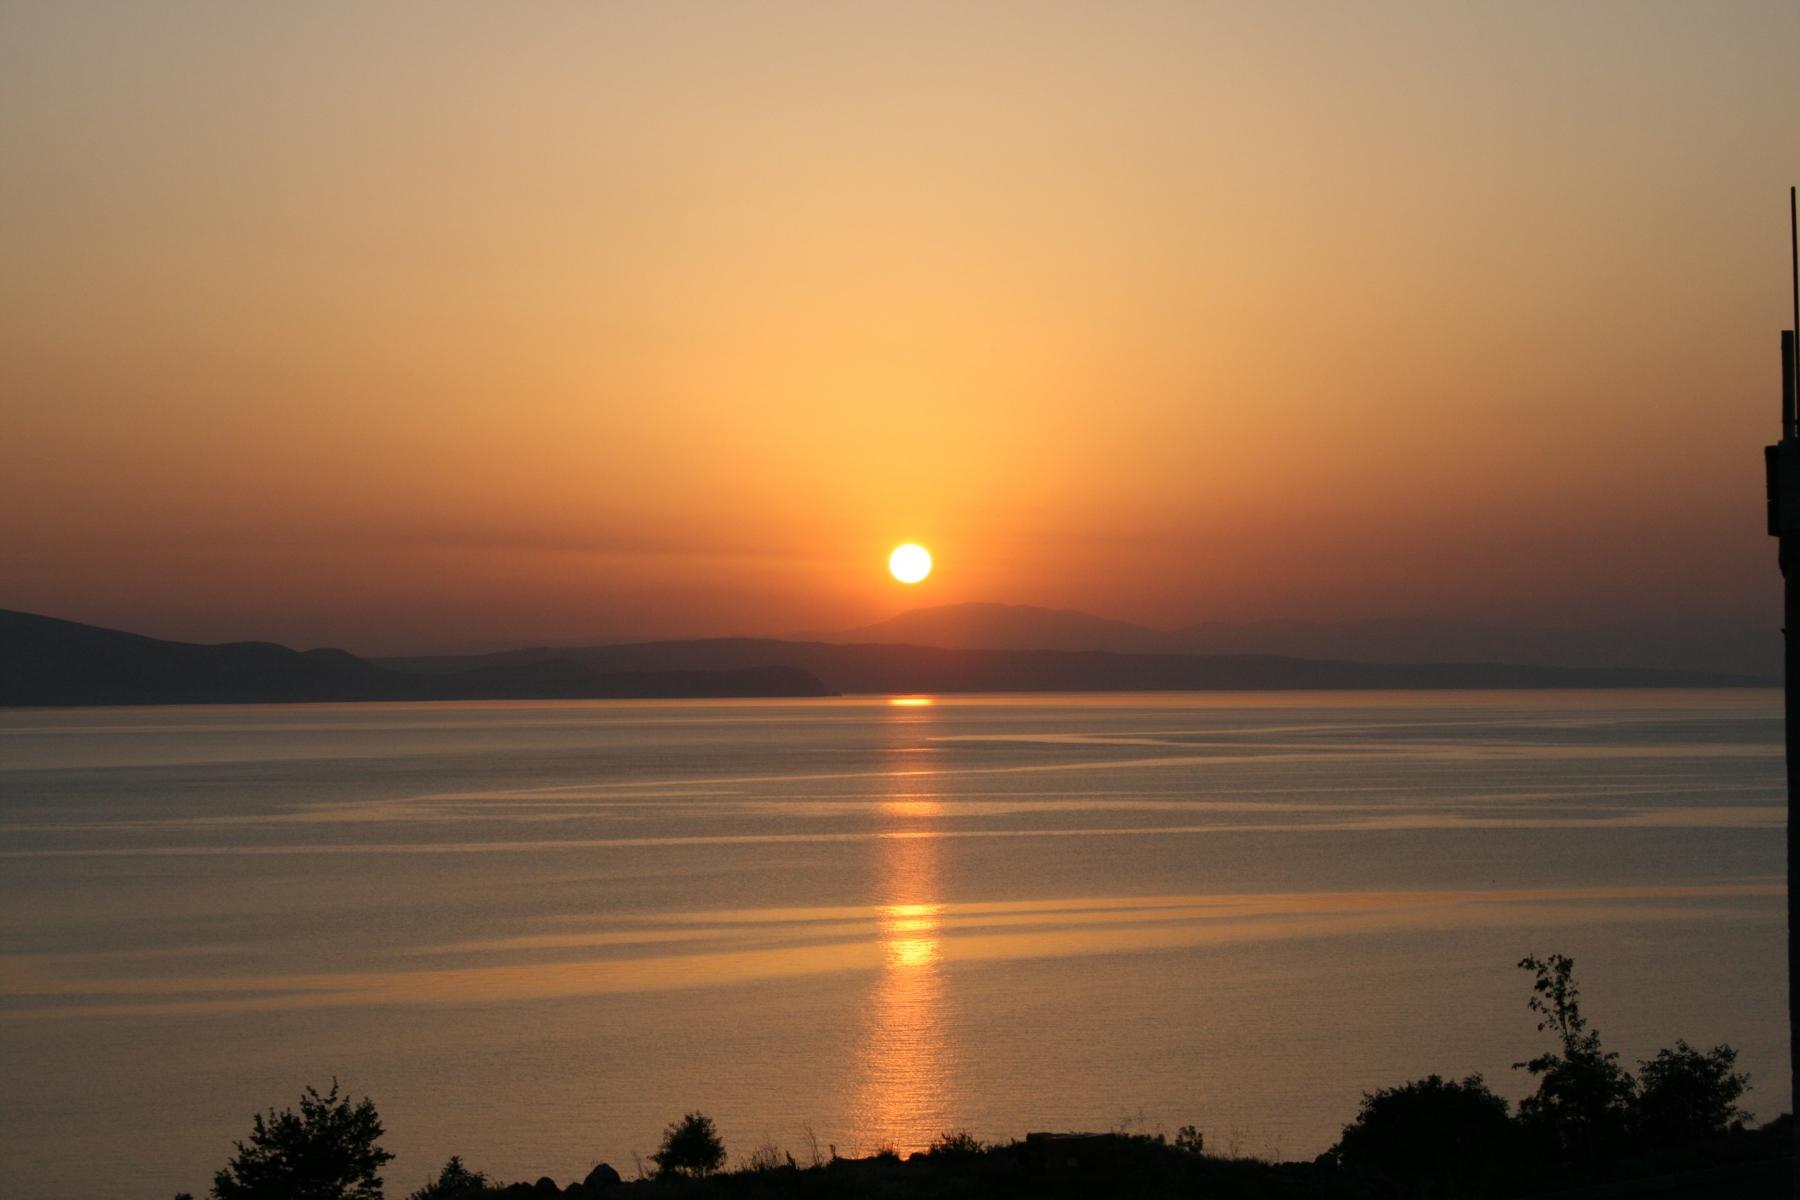 Sonnenunter-1